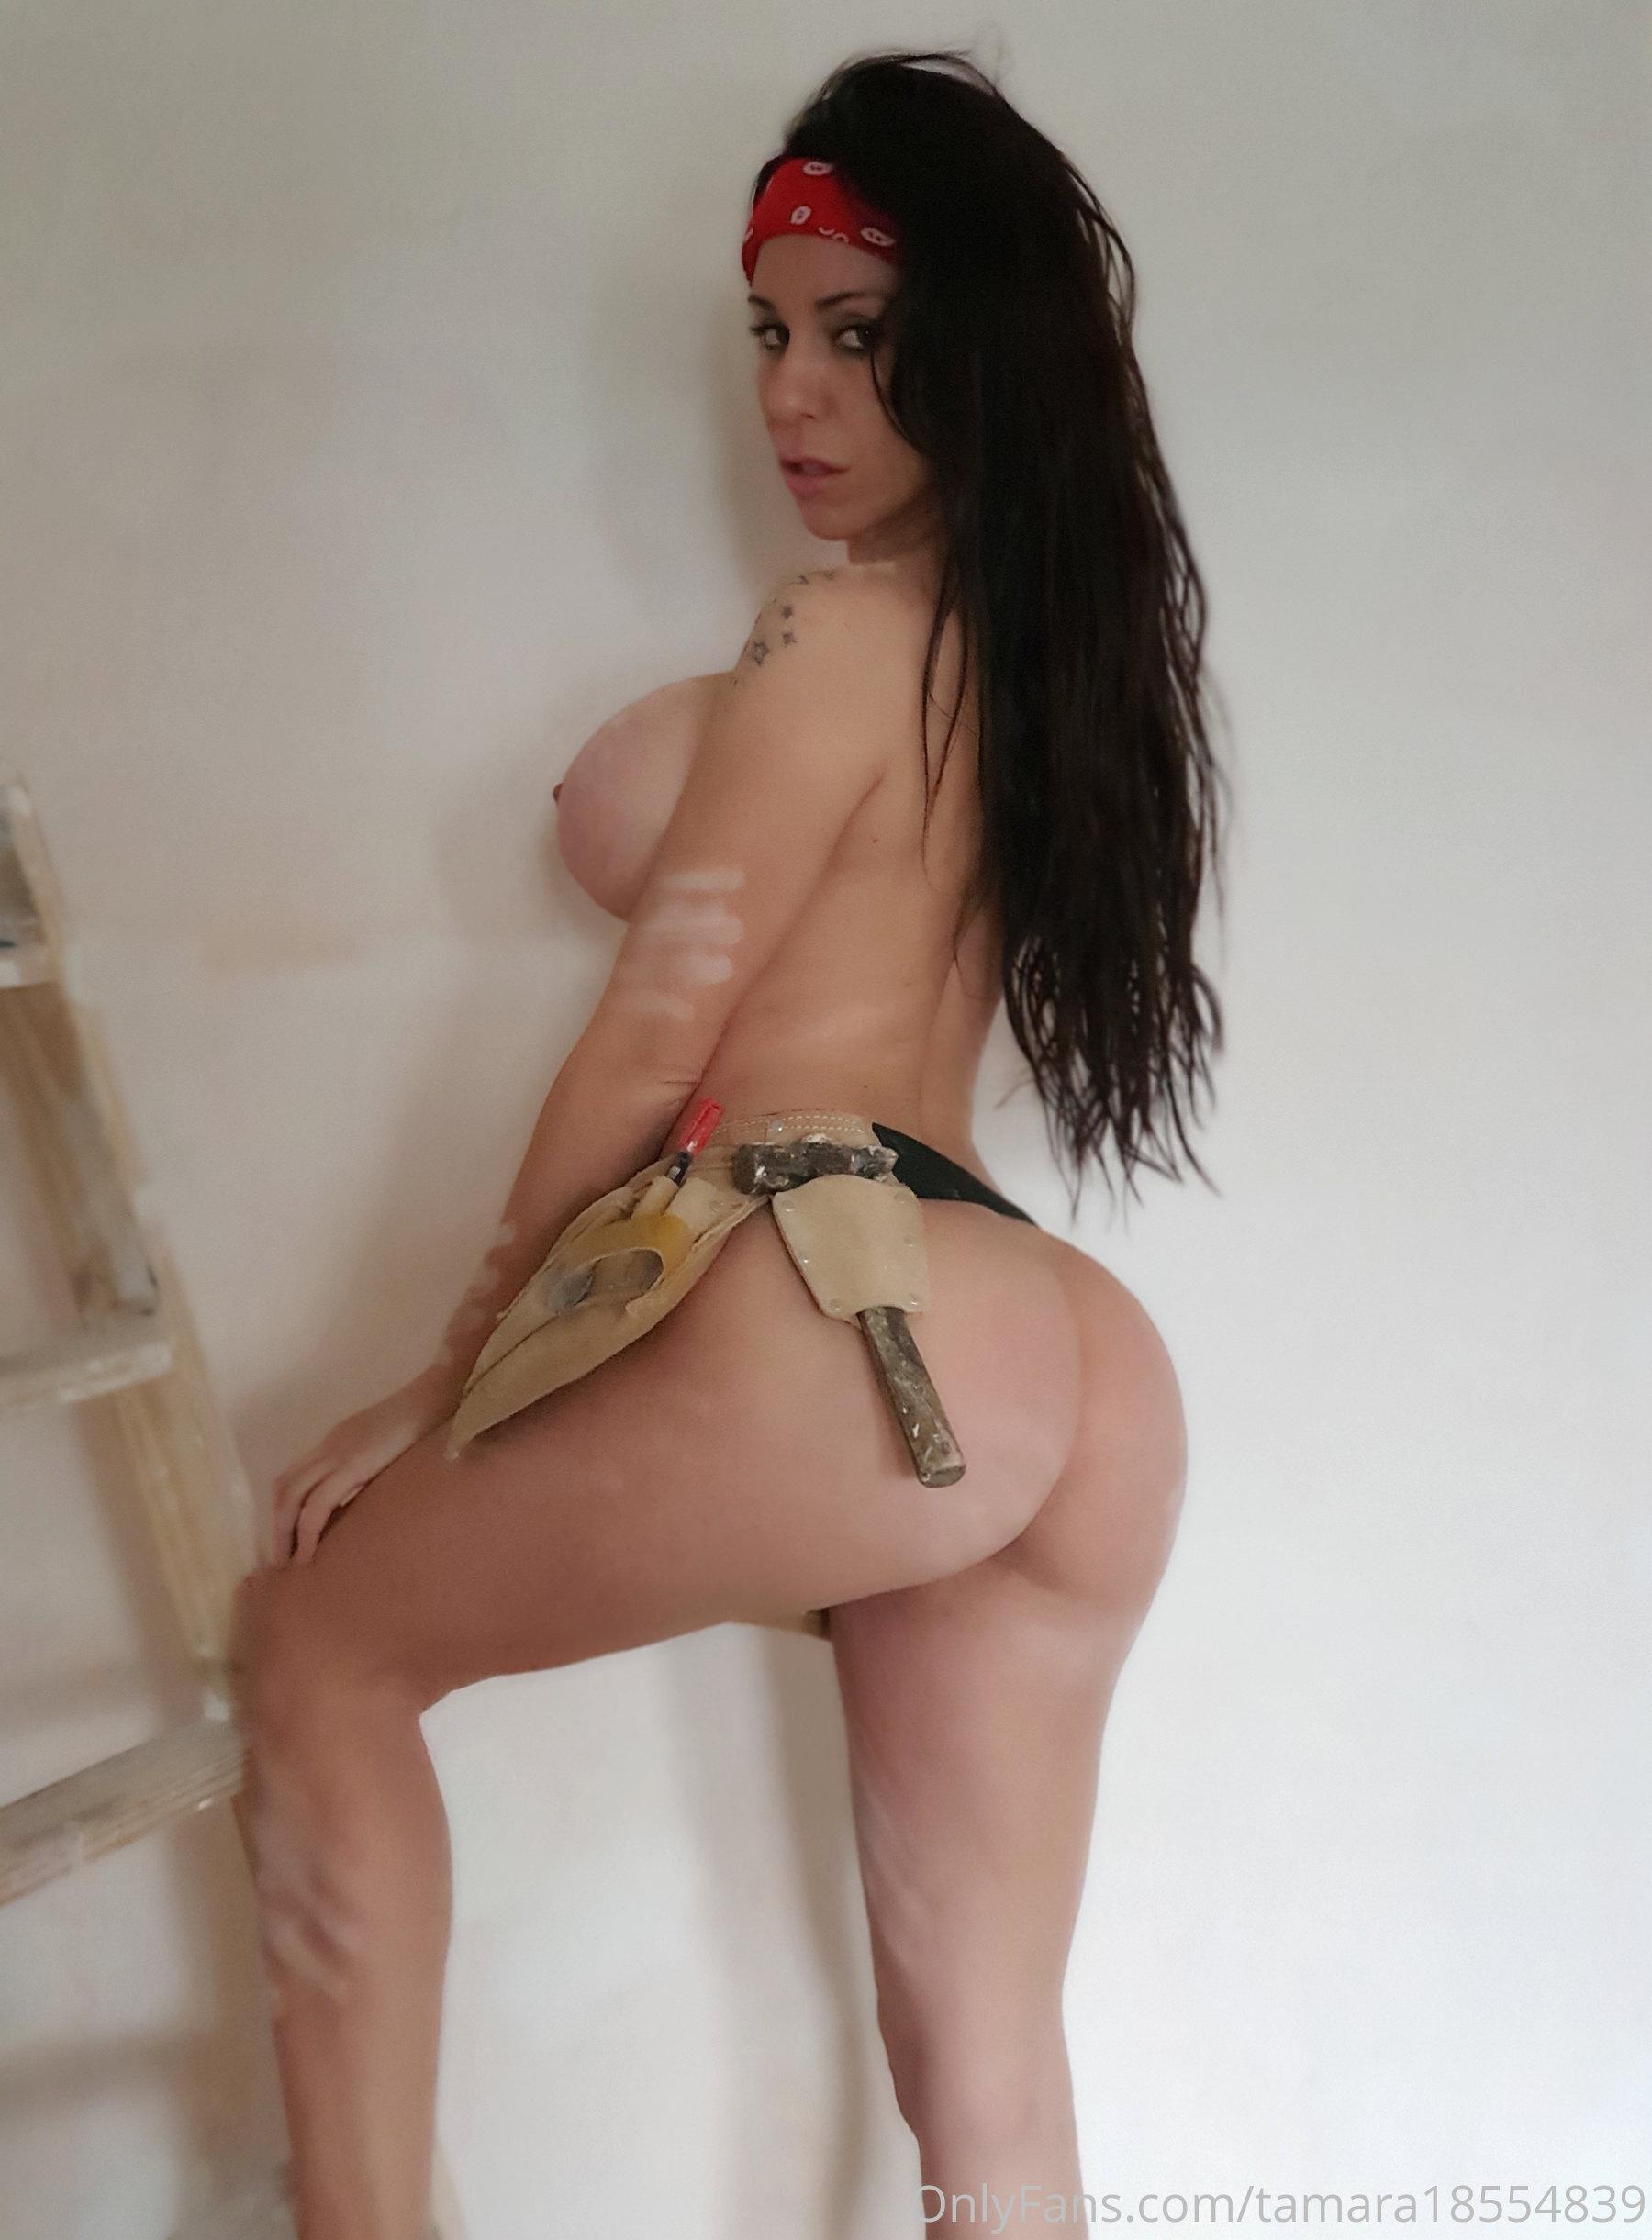 culazos, chicas onlyfans, tamara moreno, fotos gratis onlyfans